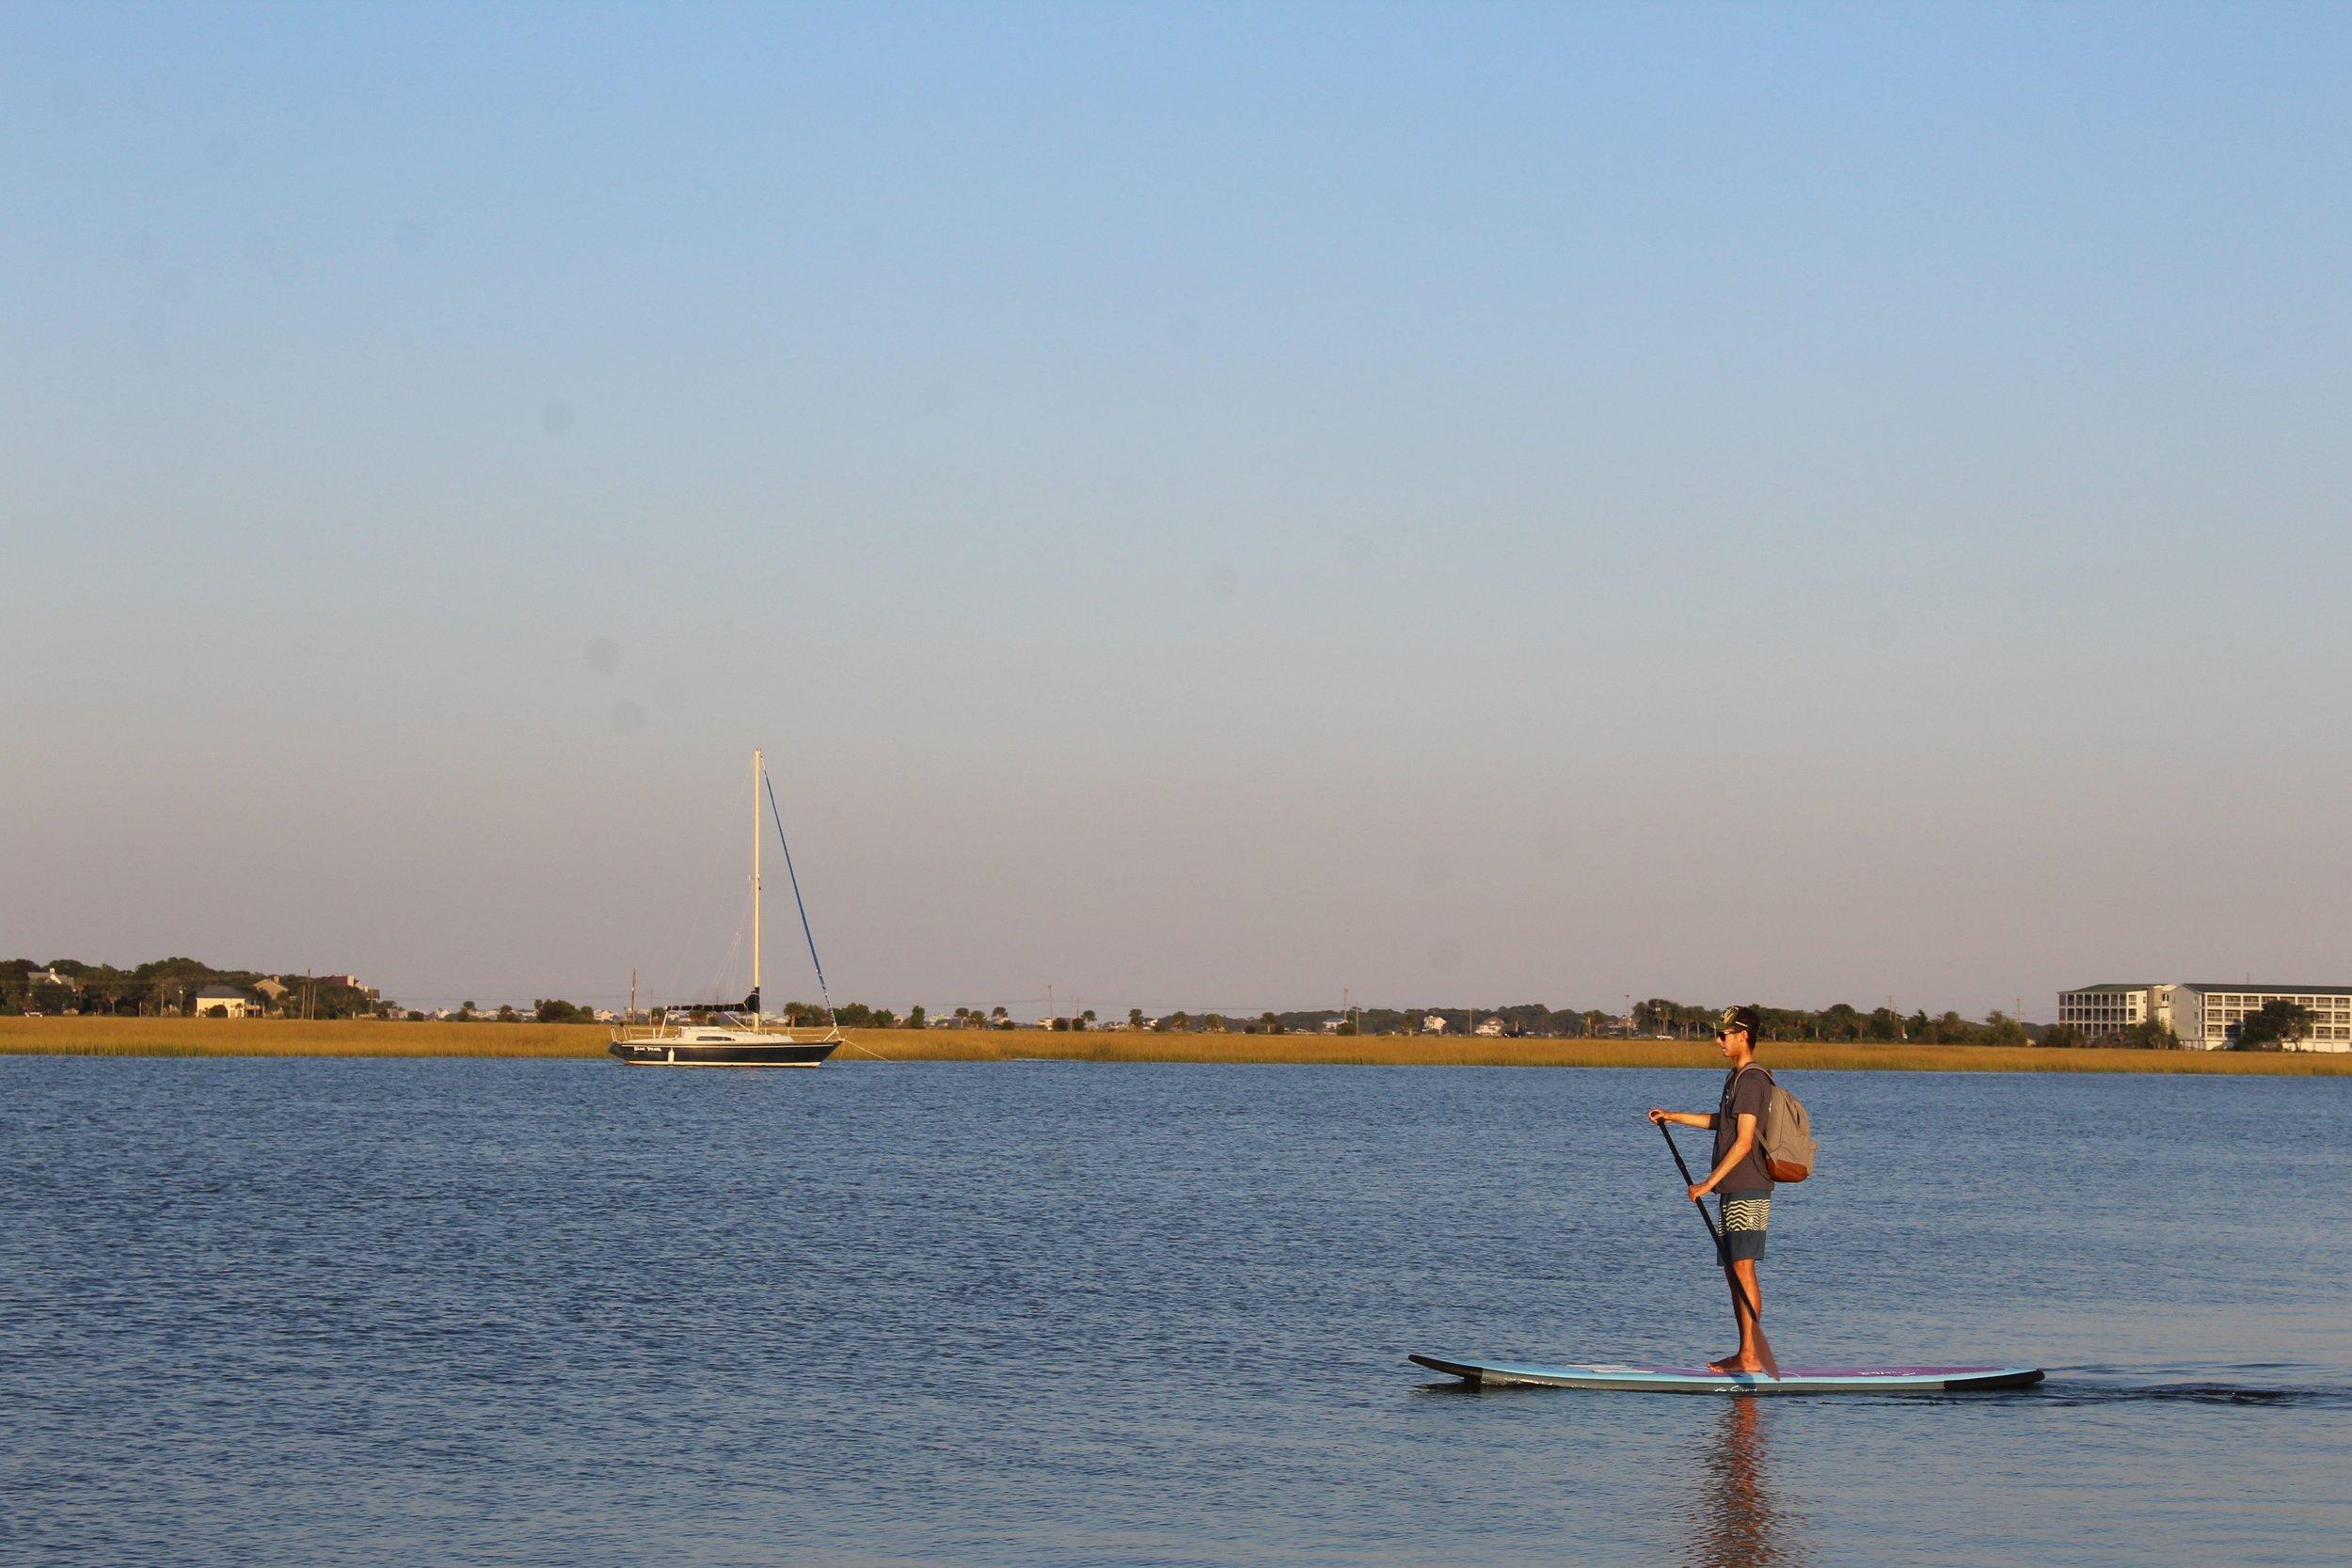 paddle-boarding-101.jpg